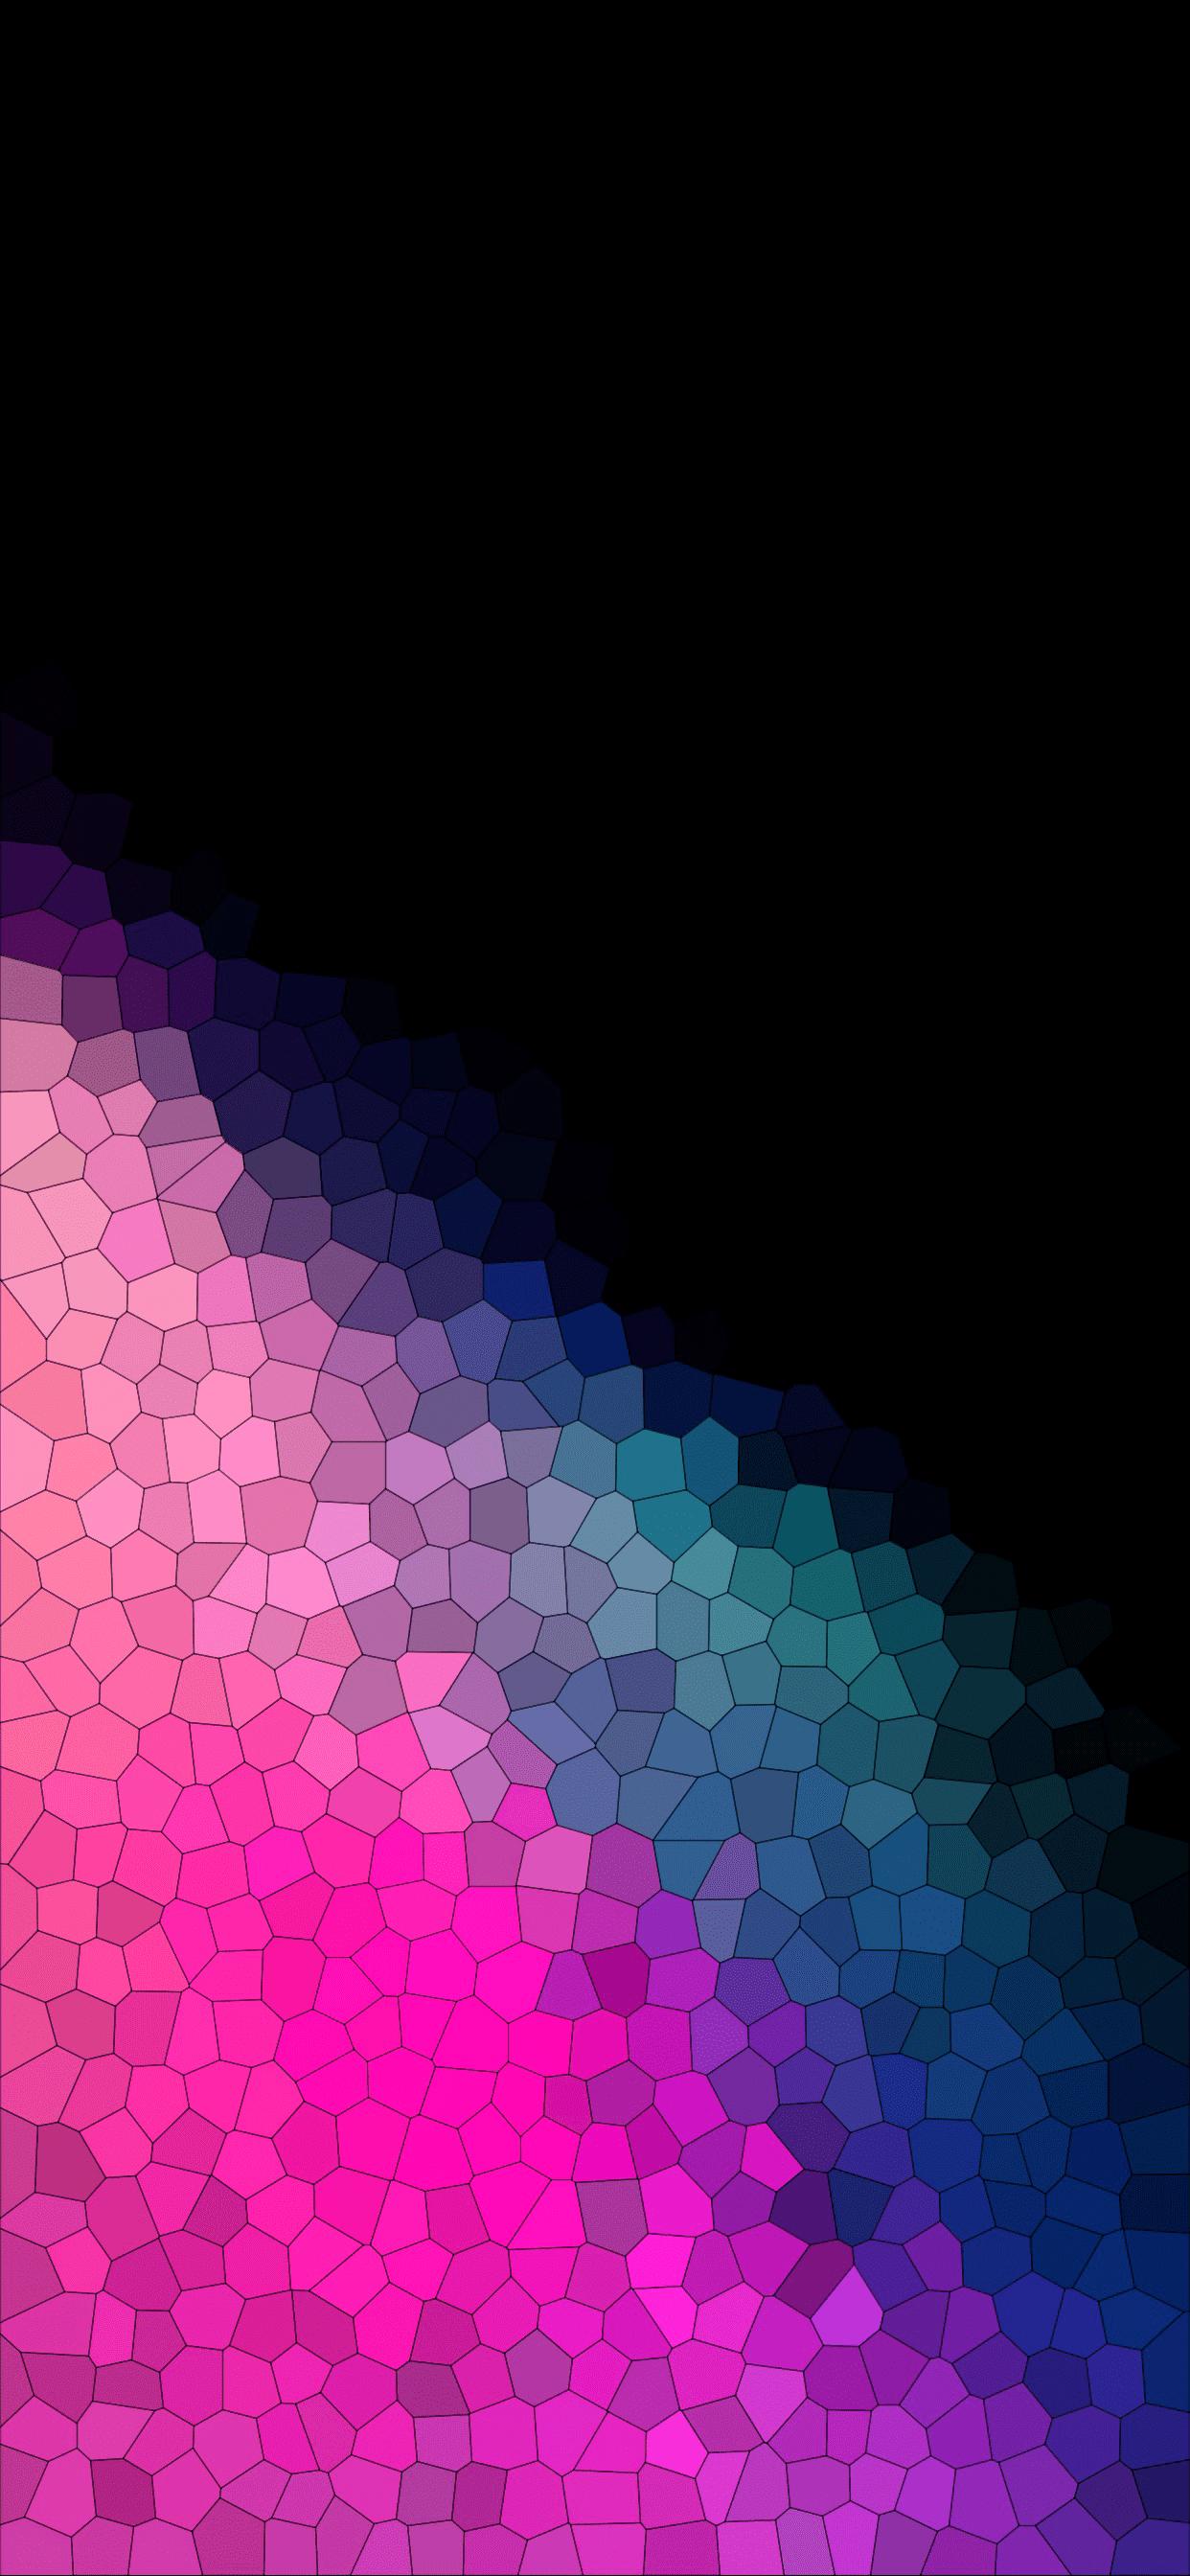 Rainbow Border Wallpaper Iphone Xr